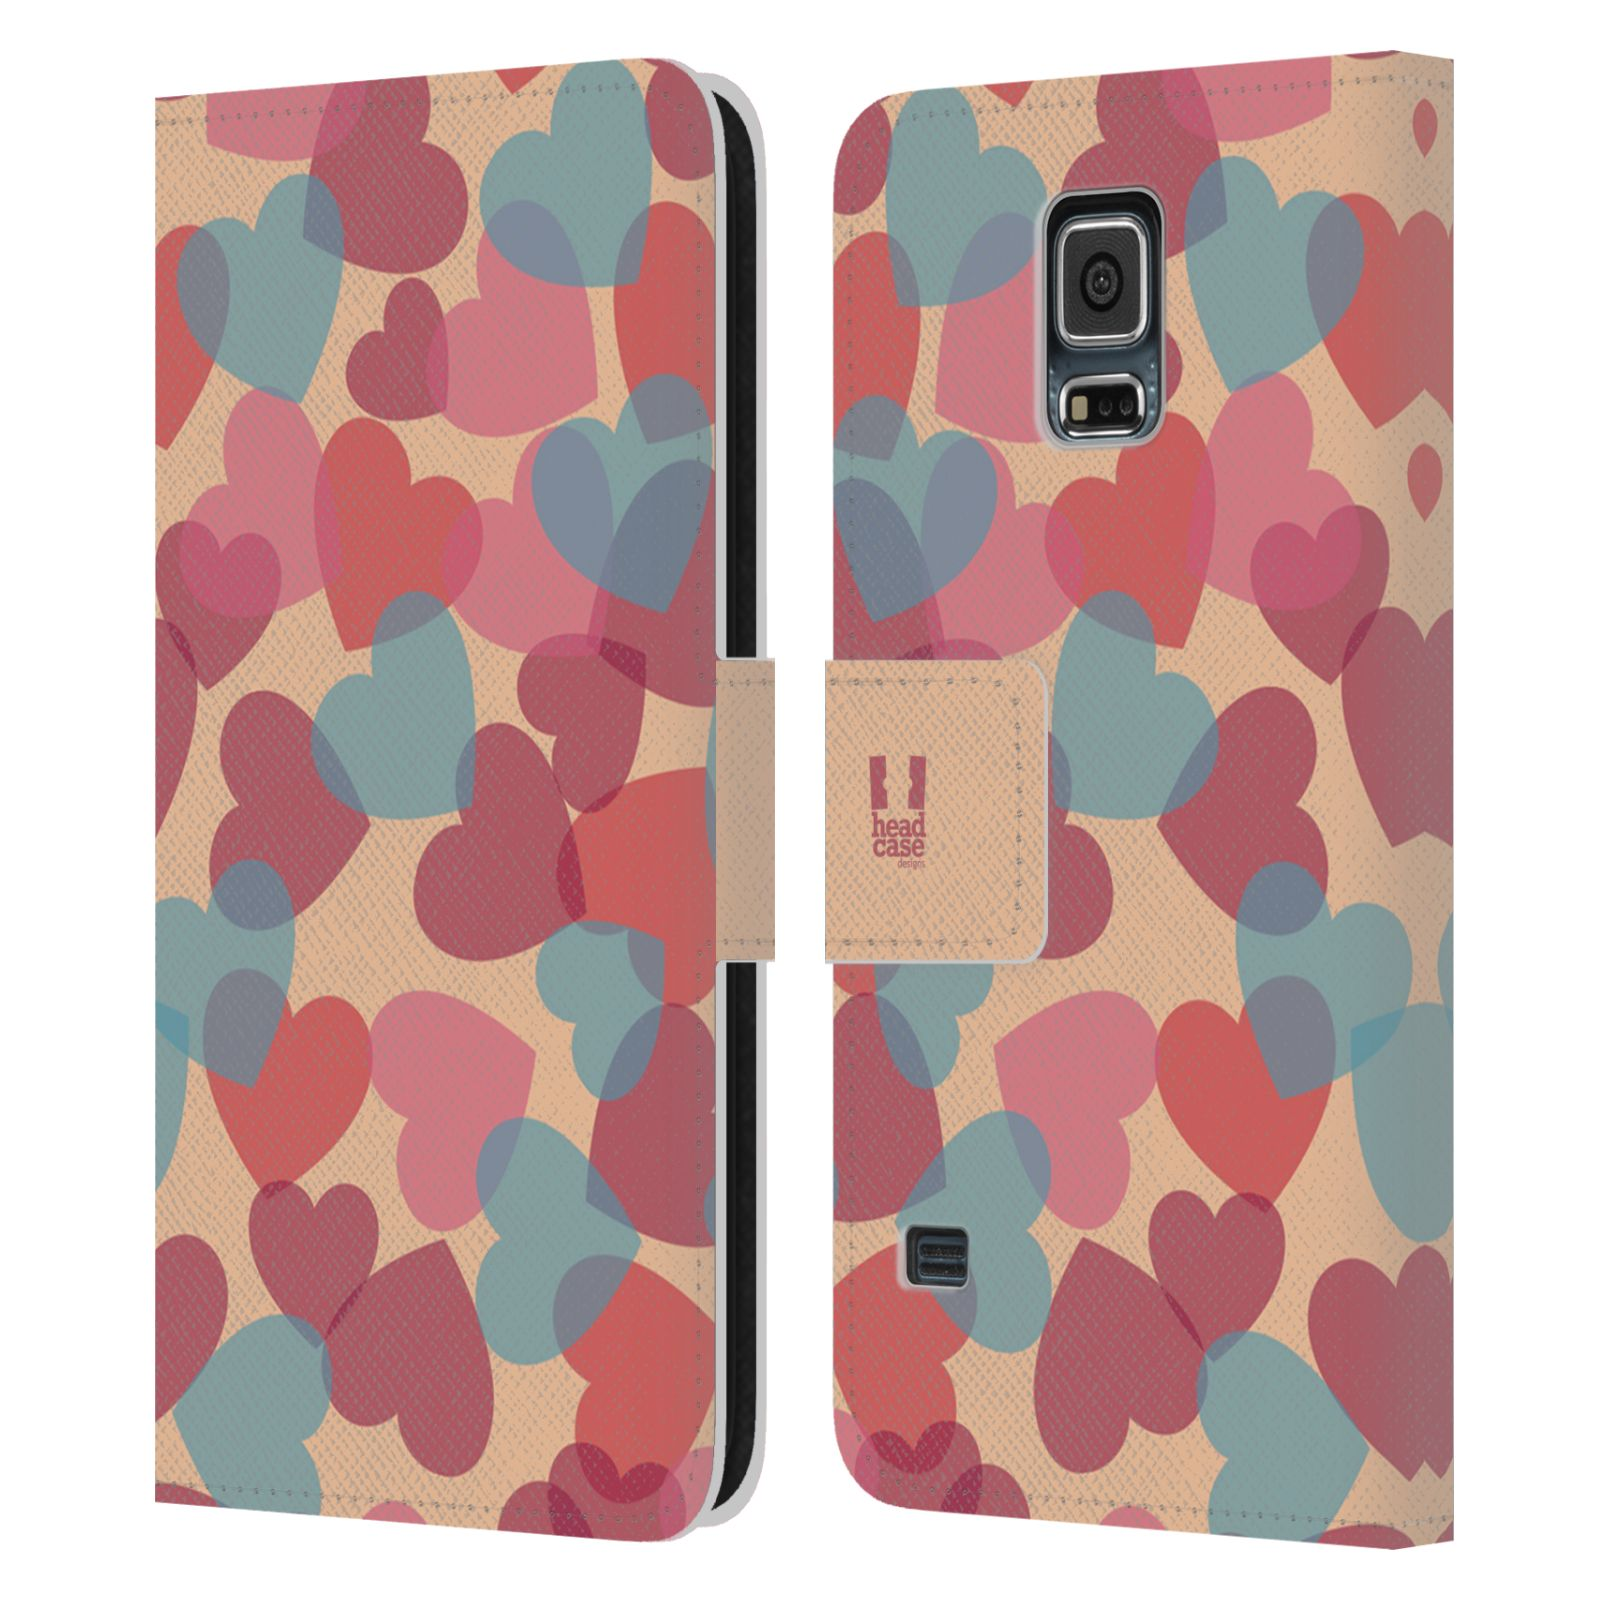 HEAD CASE Flipové pouzdro pro mobil Samsung Galaxy S5 / S5 NEO vzor prolínající se srdíčka, srdce, láska, růžová